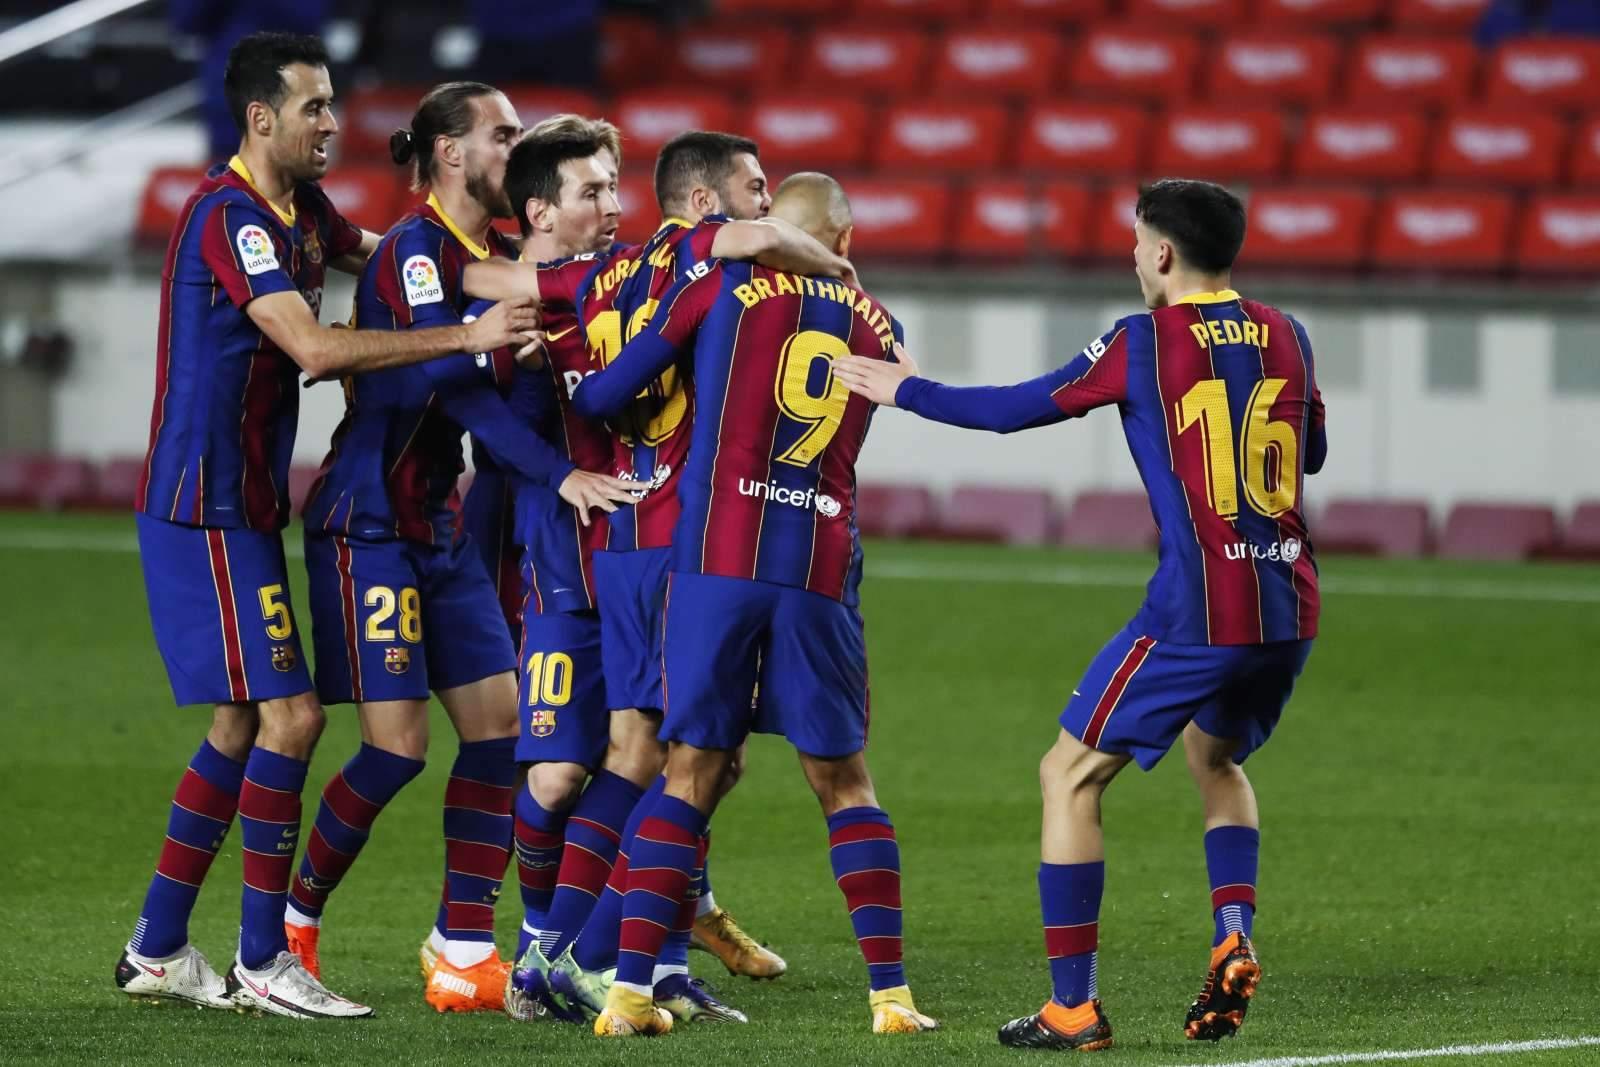 «Реал Сосьедад» - «Барселона» - 1:1, пен. 2:3 (закончен)